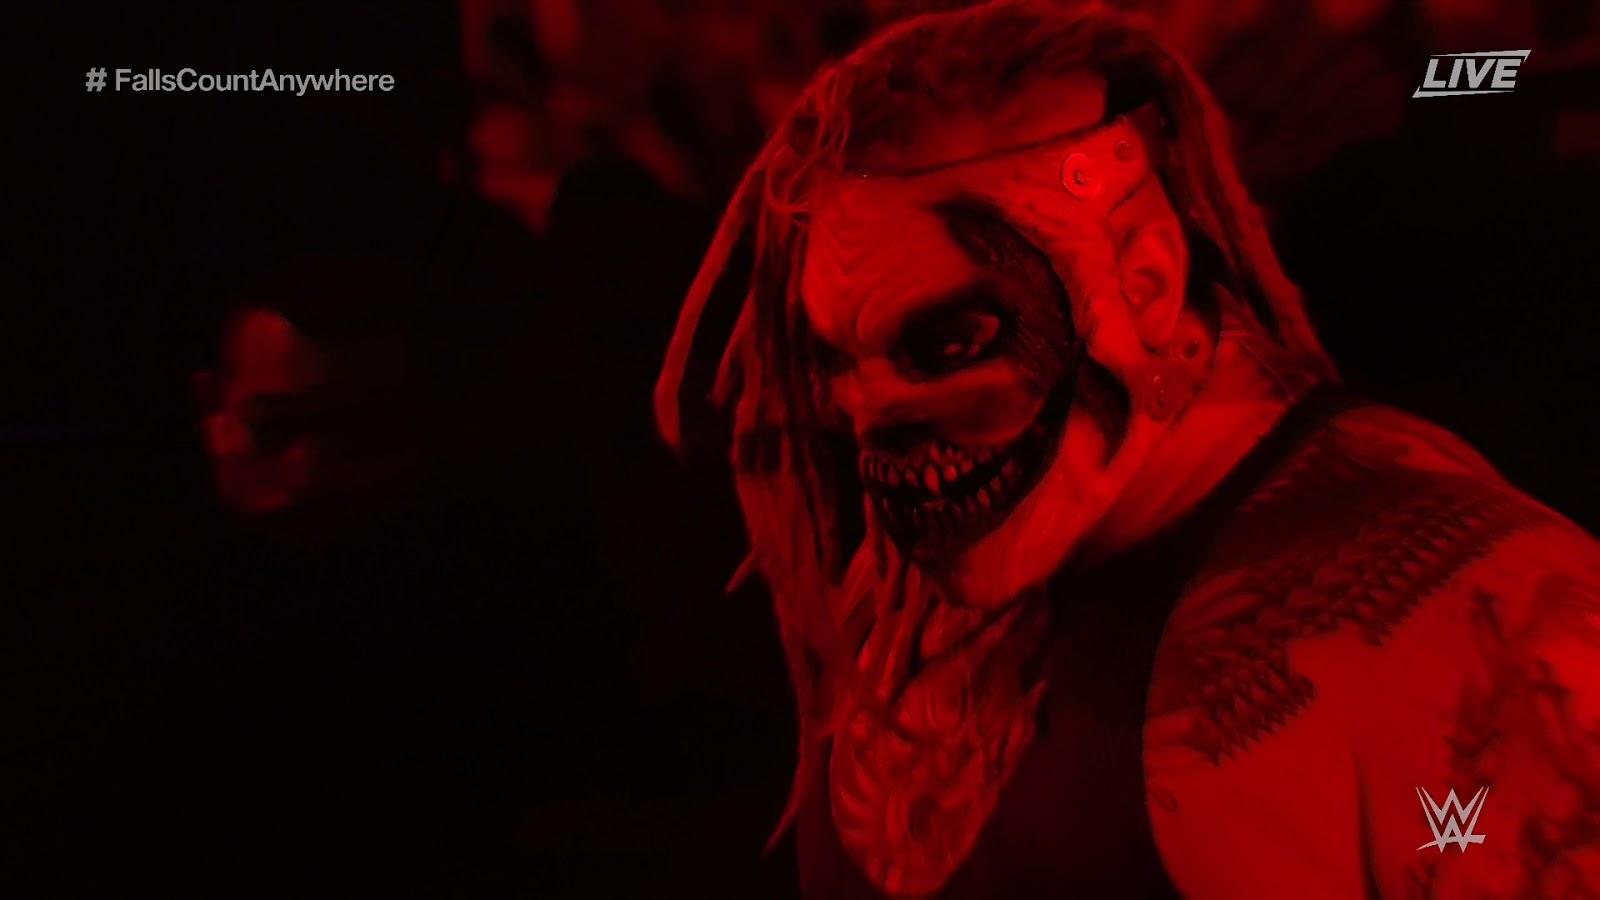 WWE+CJ+%282019%29+Full+HD+1080p+Latino+5.1+-+Descargatepelis.com.mkv_snapshot_03.11.53.040.jpg (1600×900)